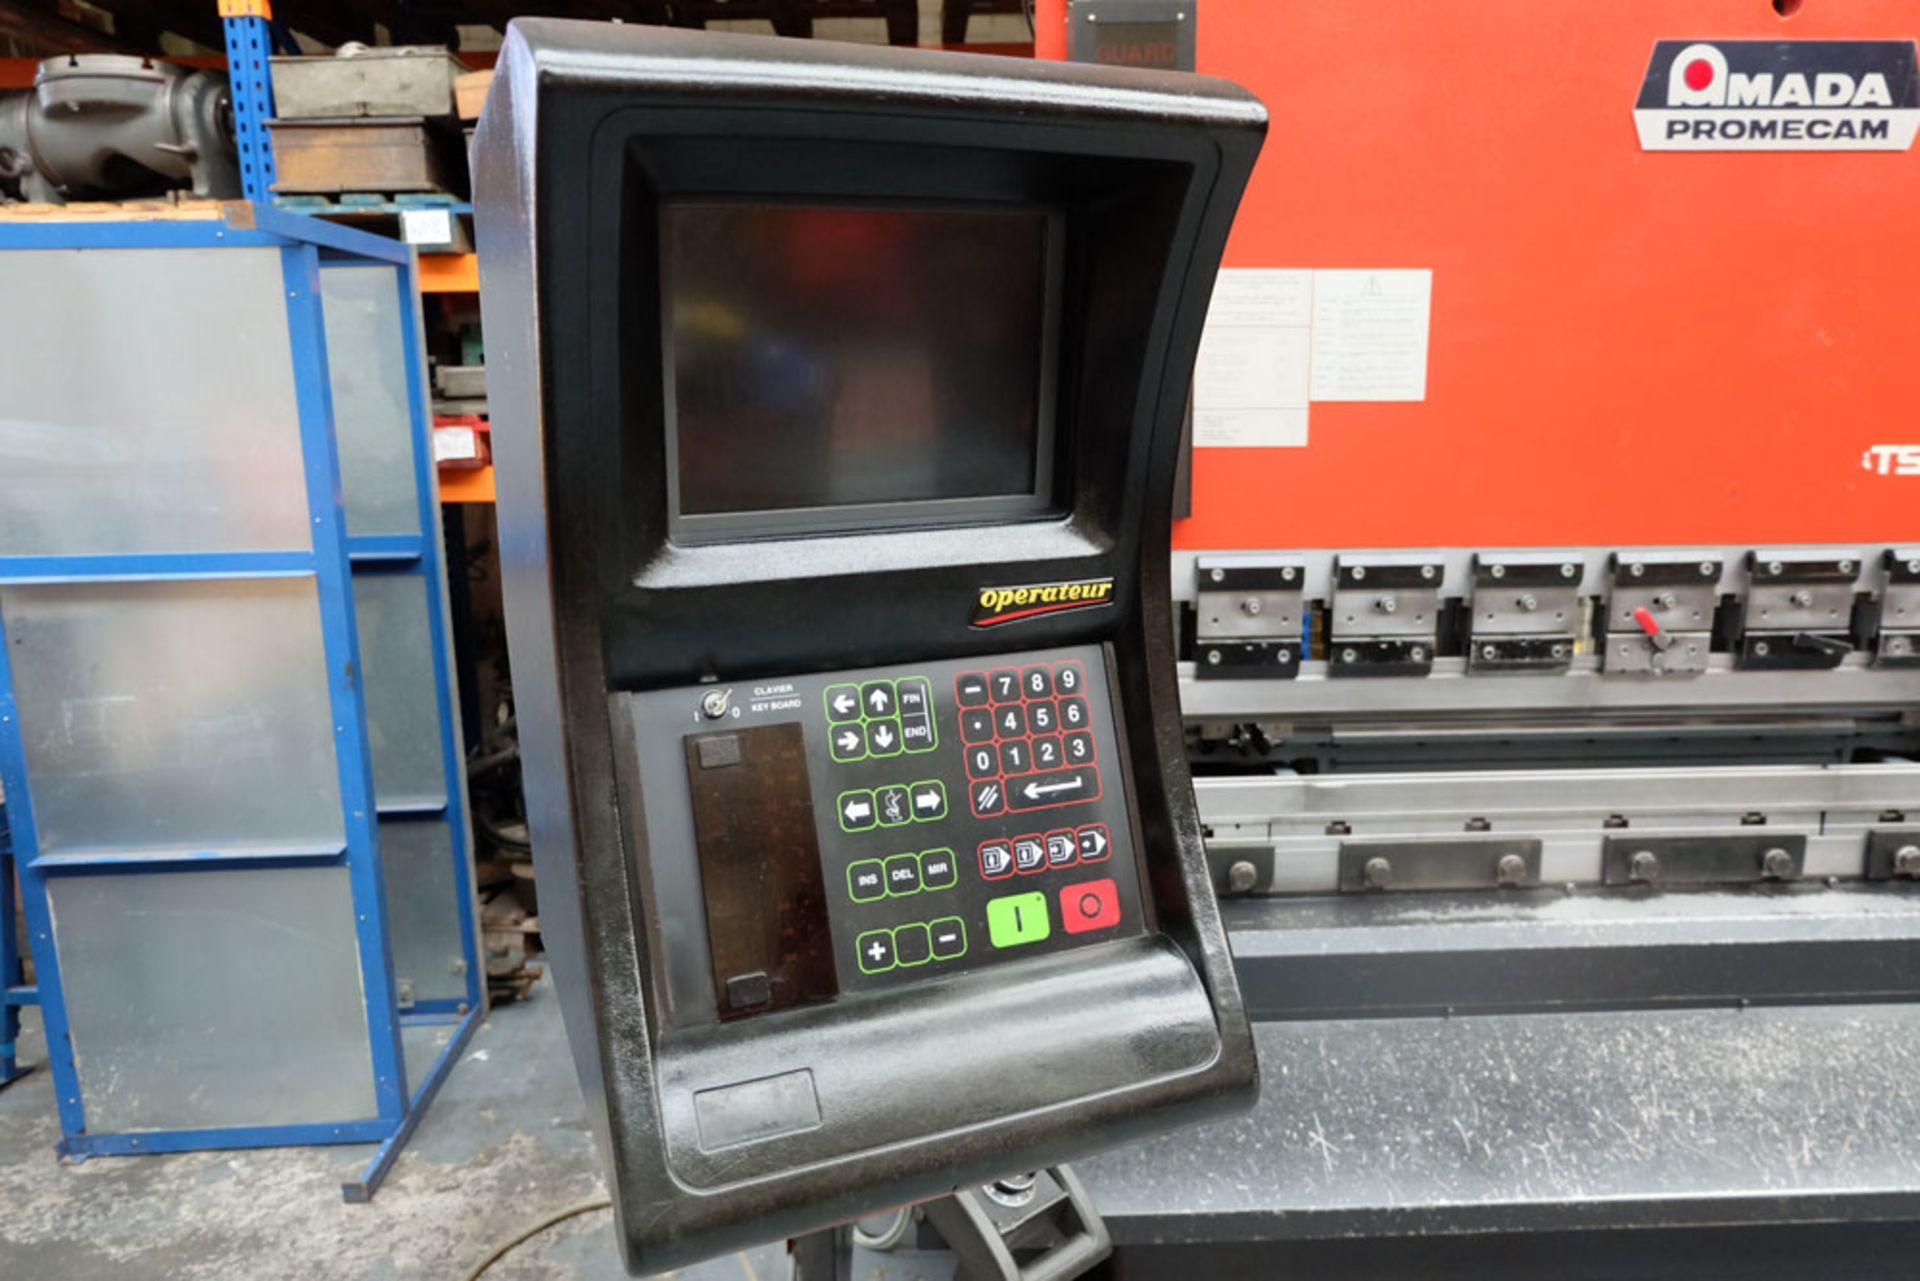 Amada ITS2 50-20 Press Brake. Capacity 2000mm x 50 Ton. - Image 4 of 17